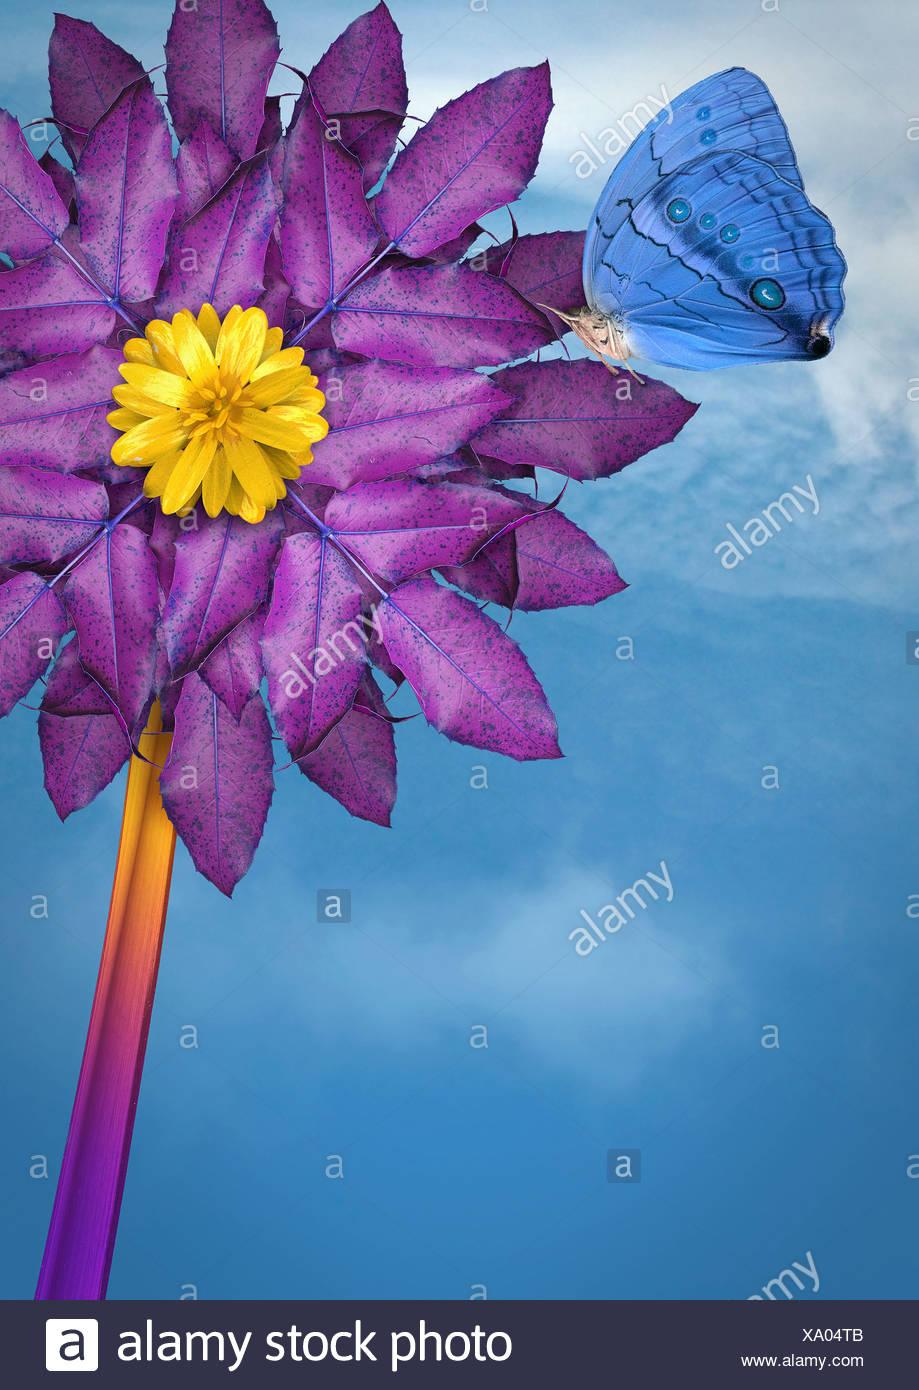 Cerca de butterfly aterrizar en flor Imagen De Stock